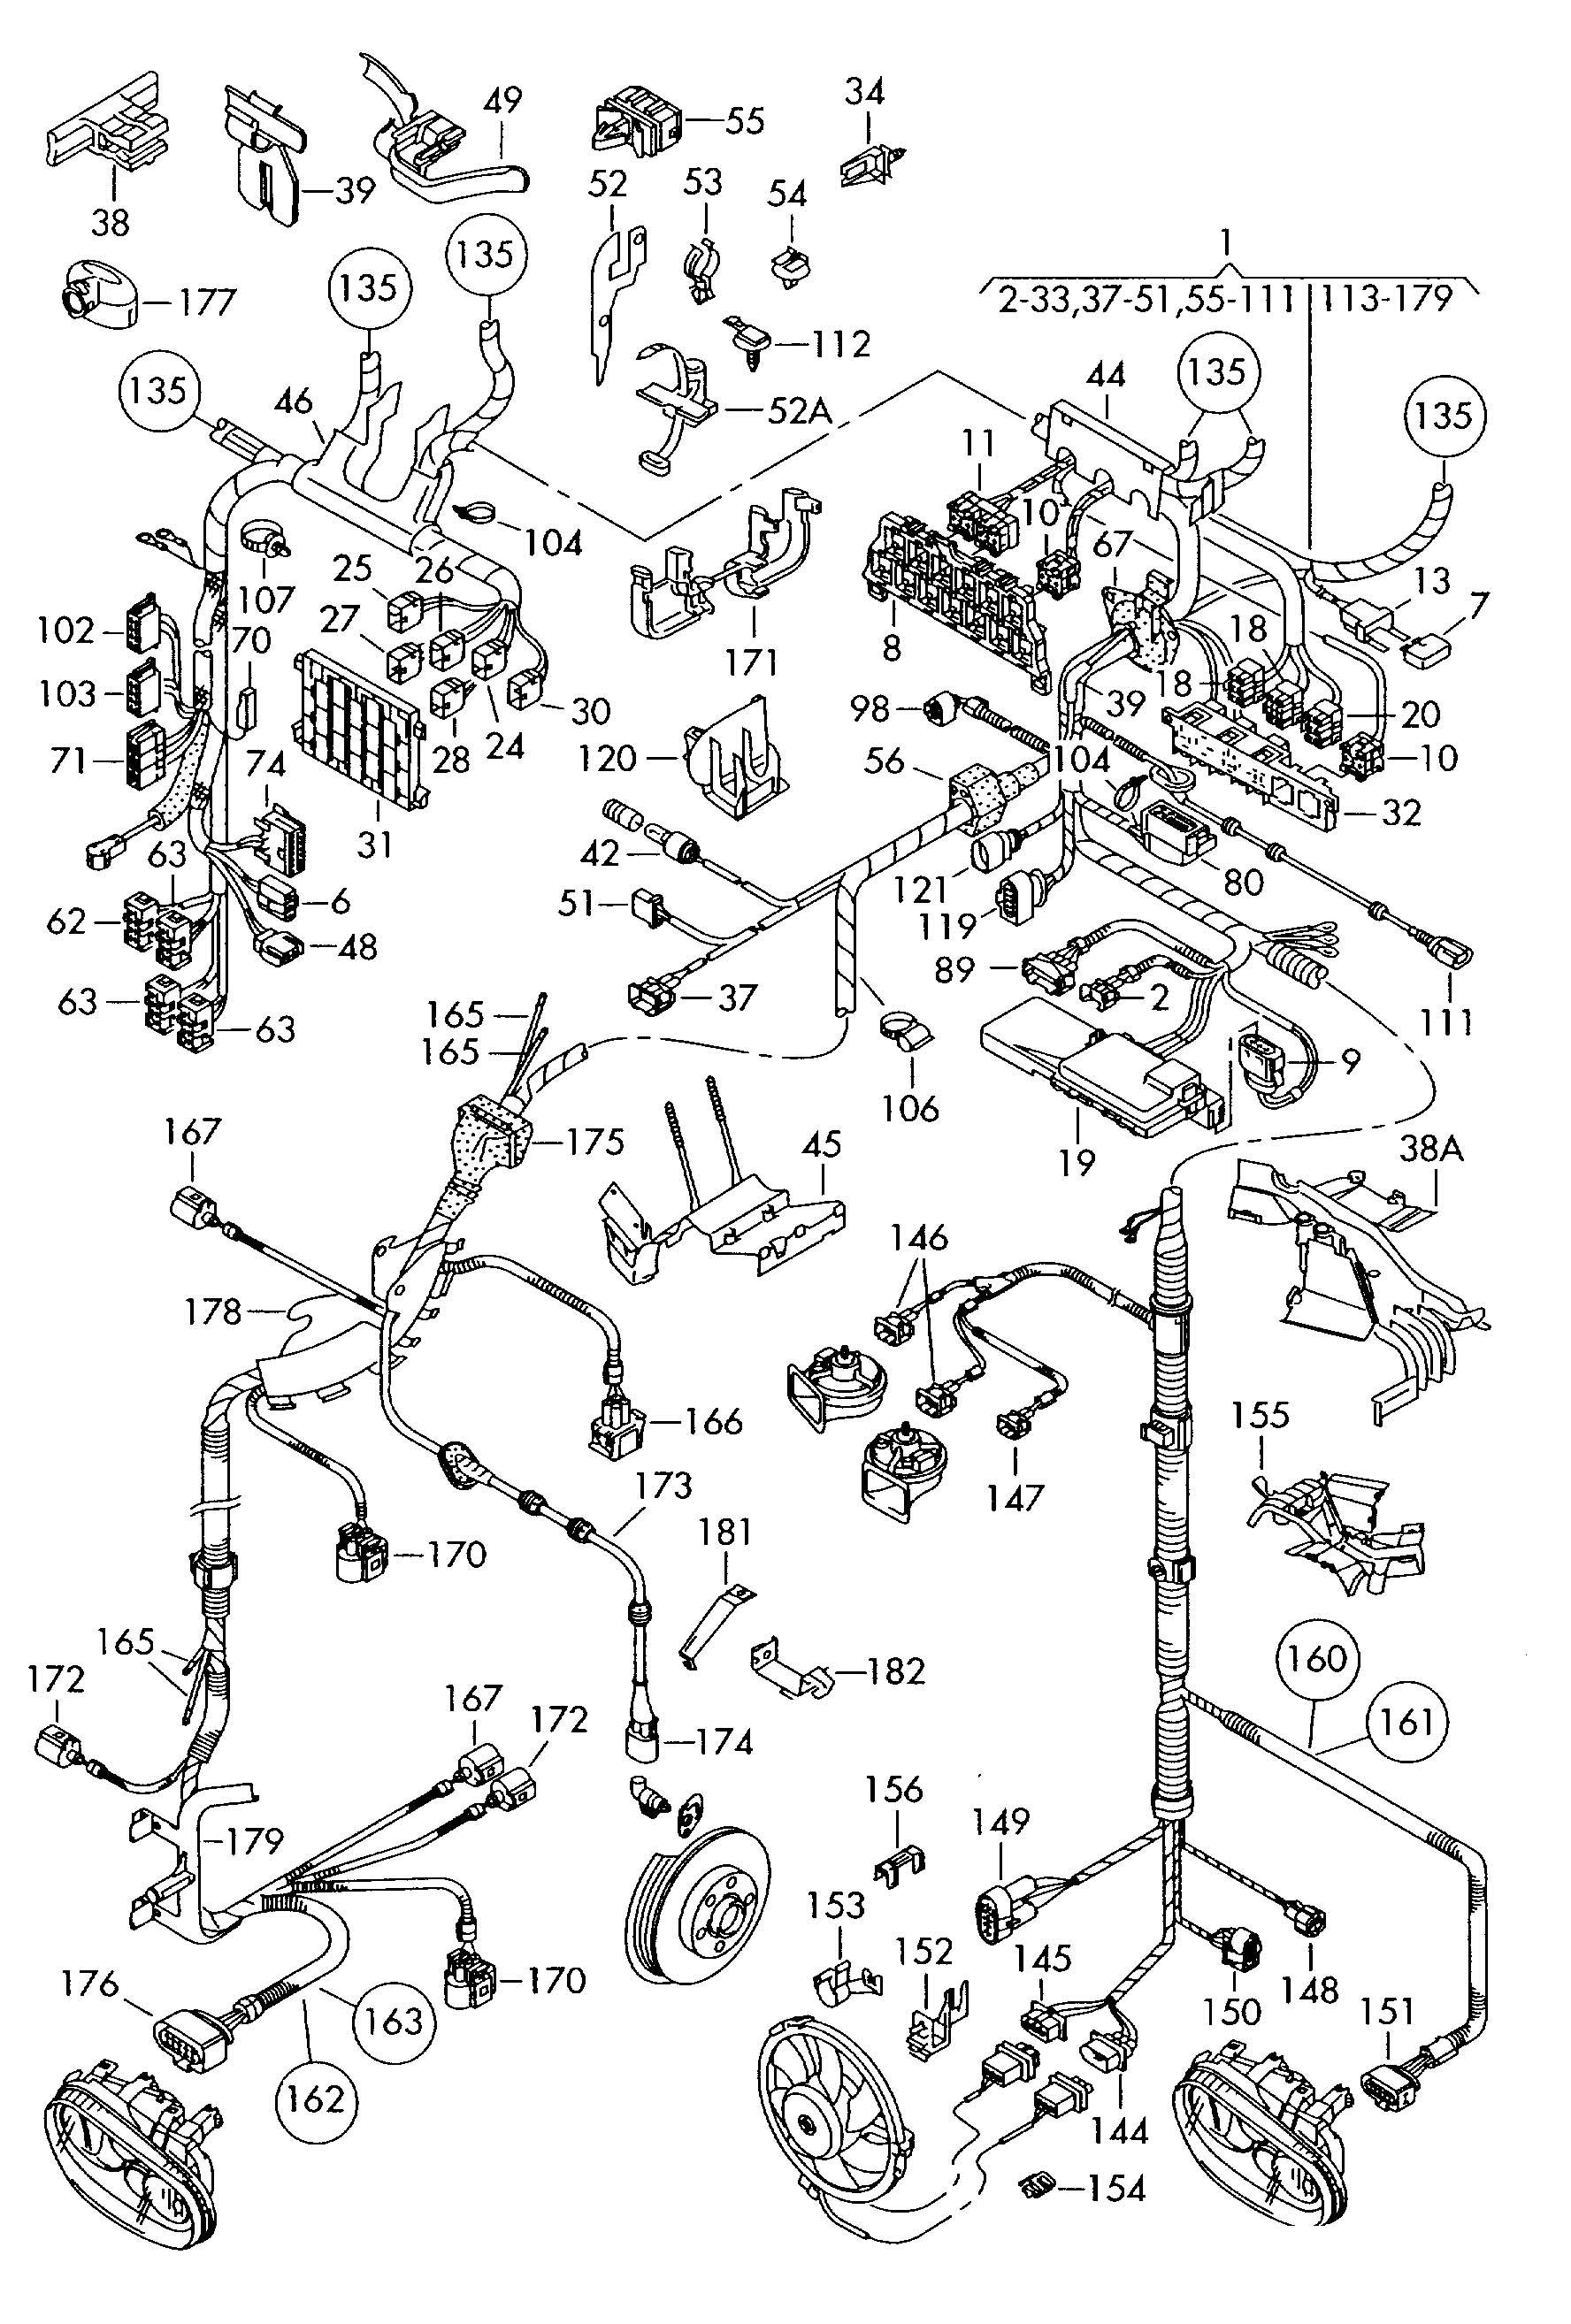 wiring diagrams area on vehicle interface module wiring diagram